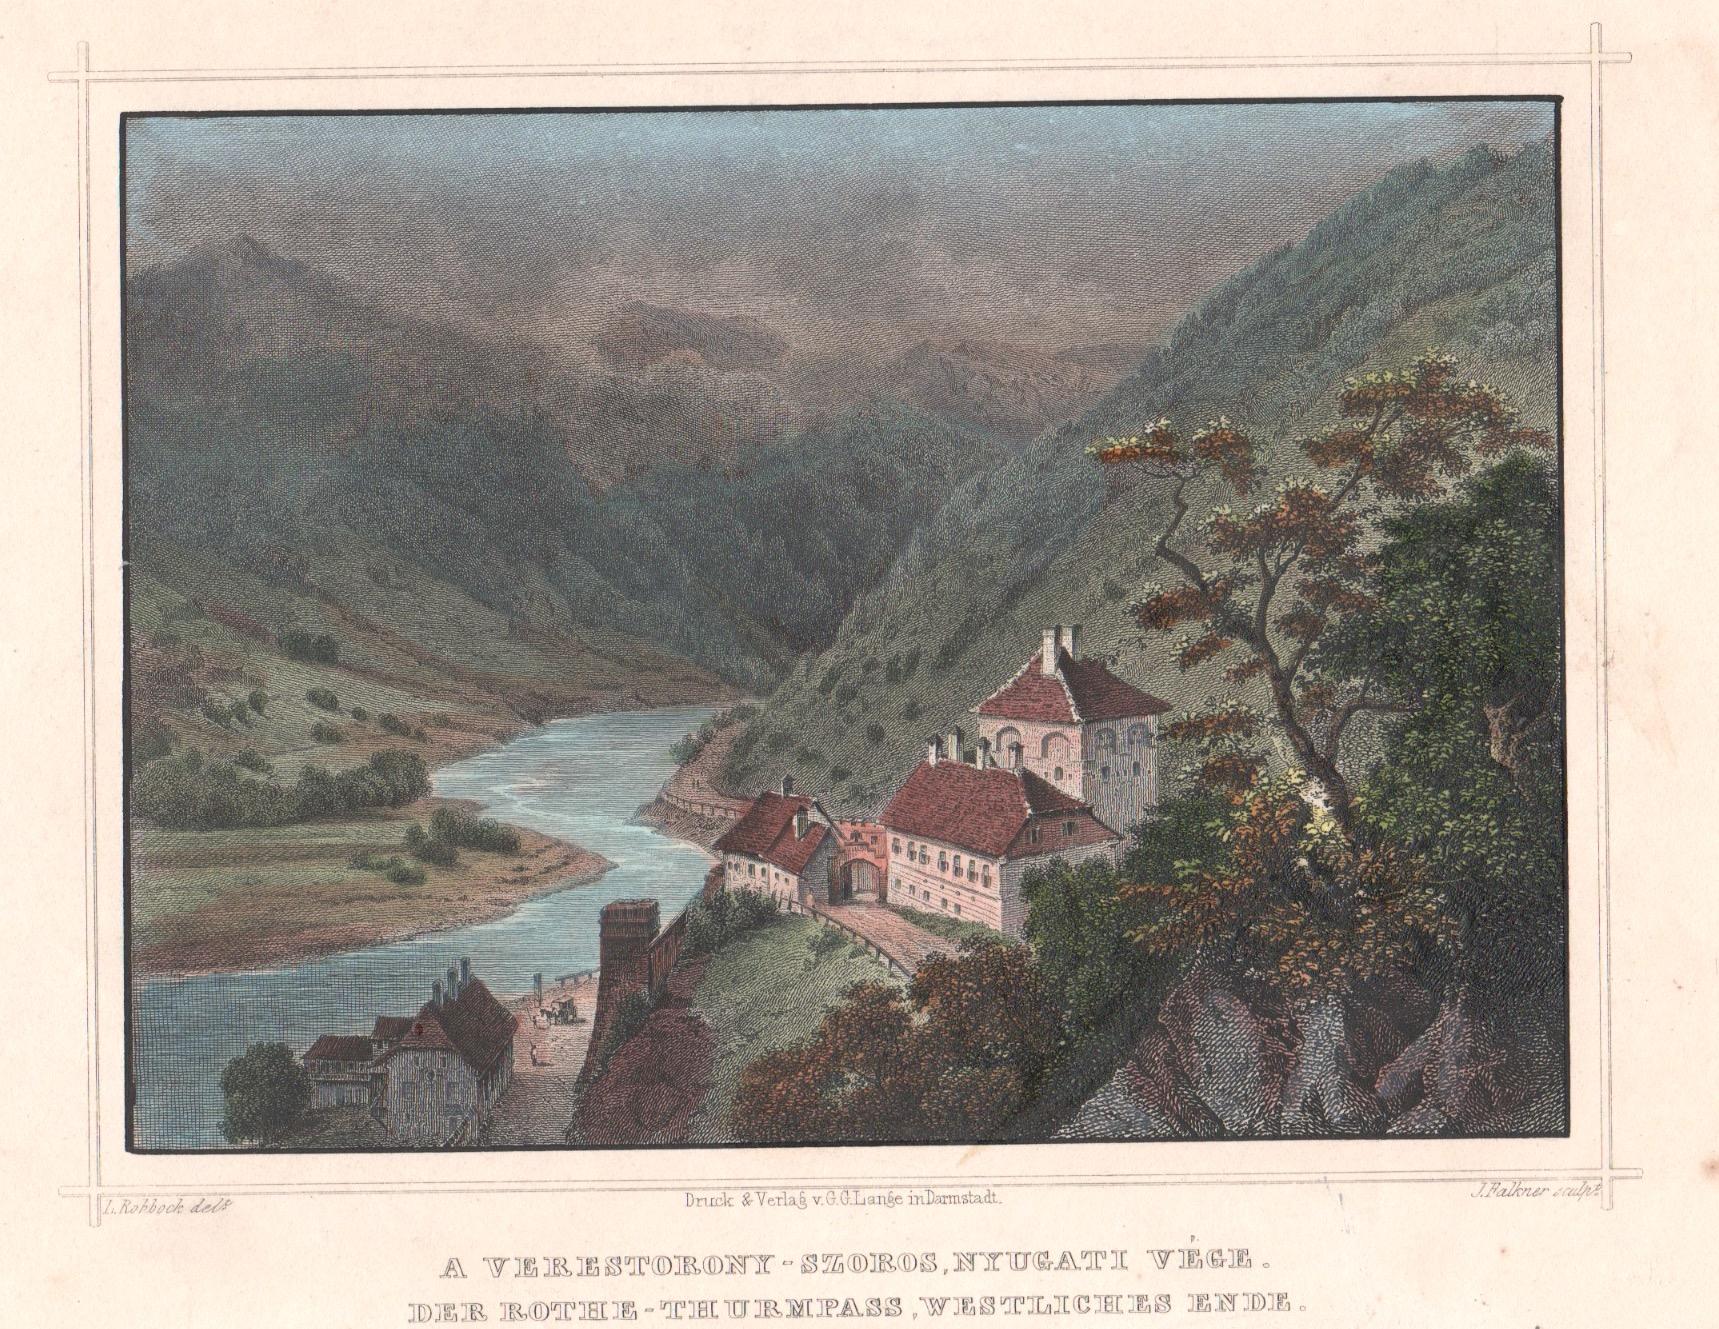 Falkner J. A Verestorony-Szoros, Nyugati Vége. Der Rothe-Thurmpass, westliches Ende.